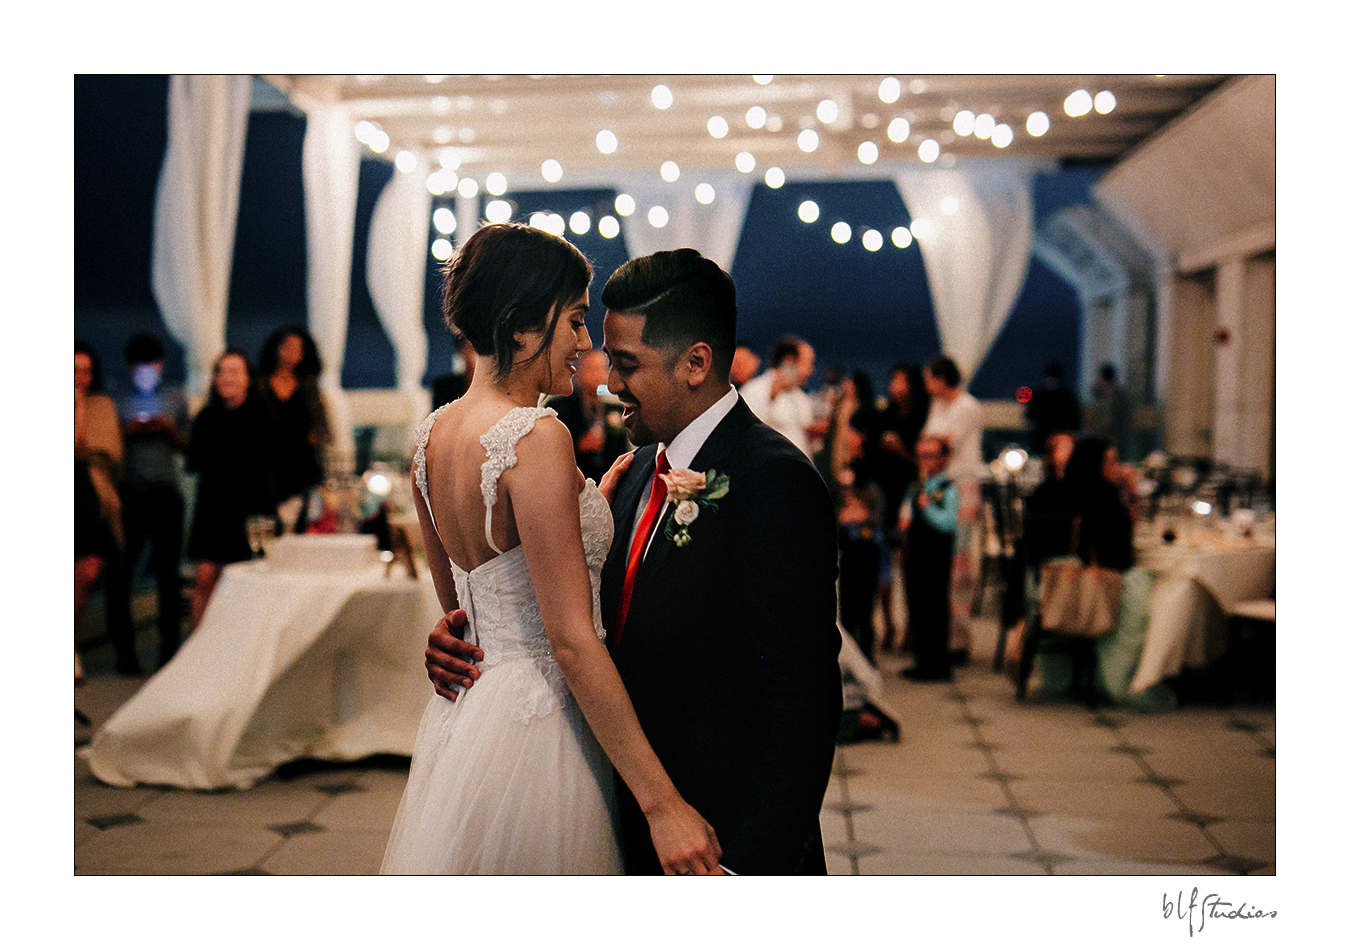 0038-blfstudios-wedding-photographer-daniel-danielle-atlanta.jpg